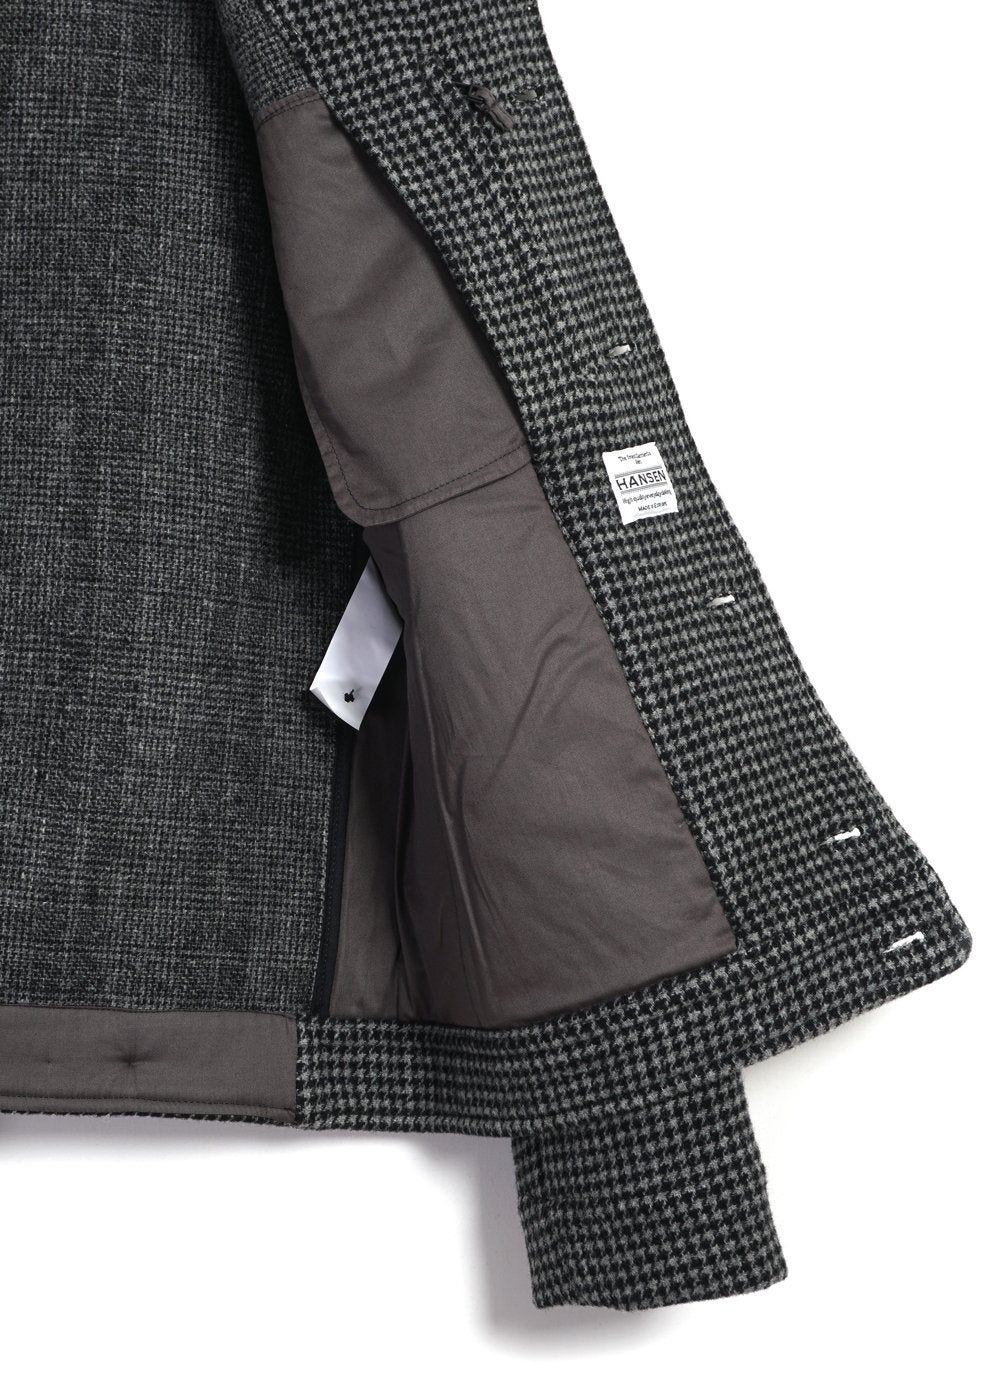 Hansen Garments | ATLAS | Short Wool Felt Jacket | pepper